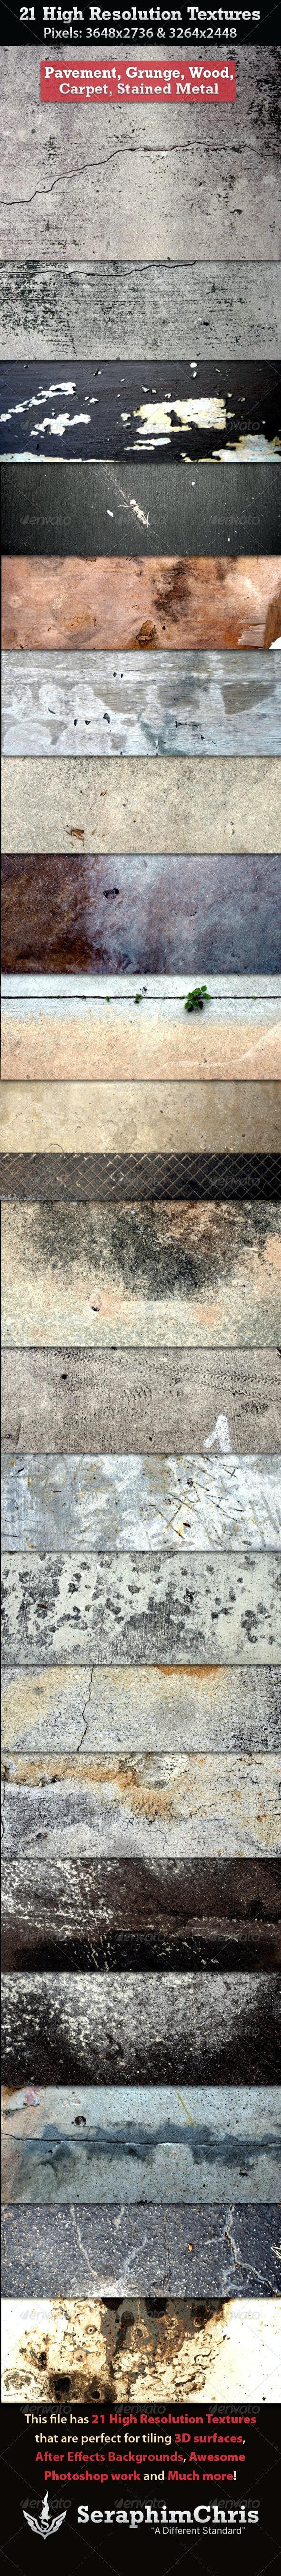 21 High Resolution Textures - Industrial / Grunge Textures